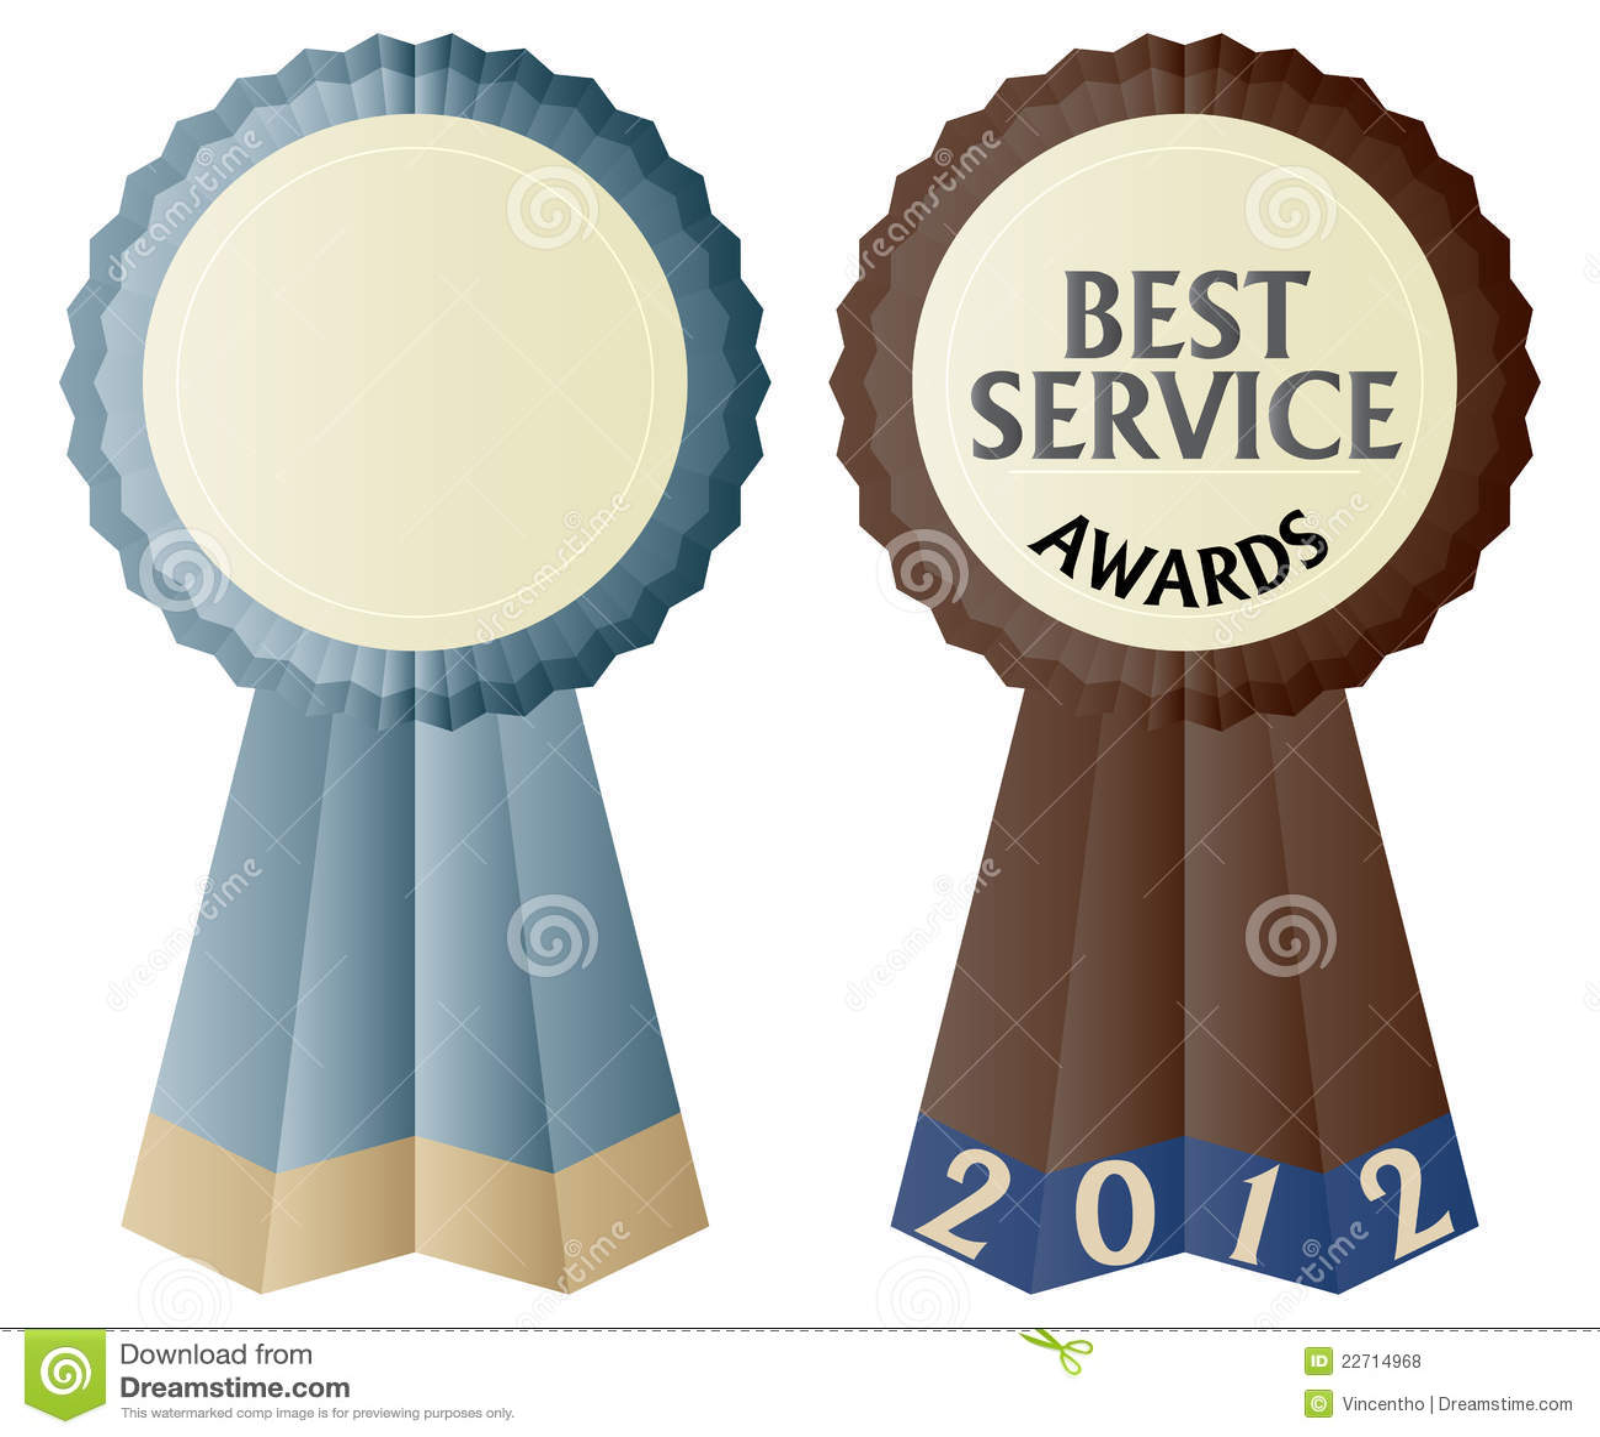 The Best Service Awards Ribbon Illustration Royalty Free ...